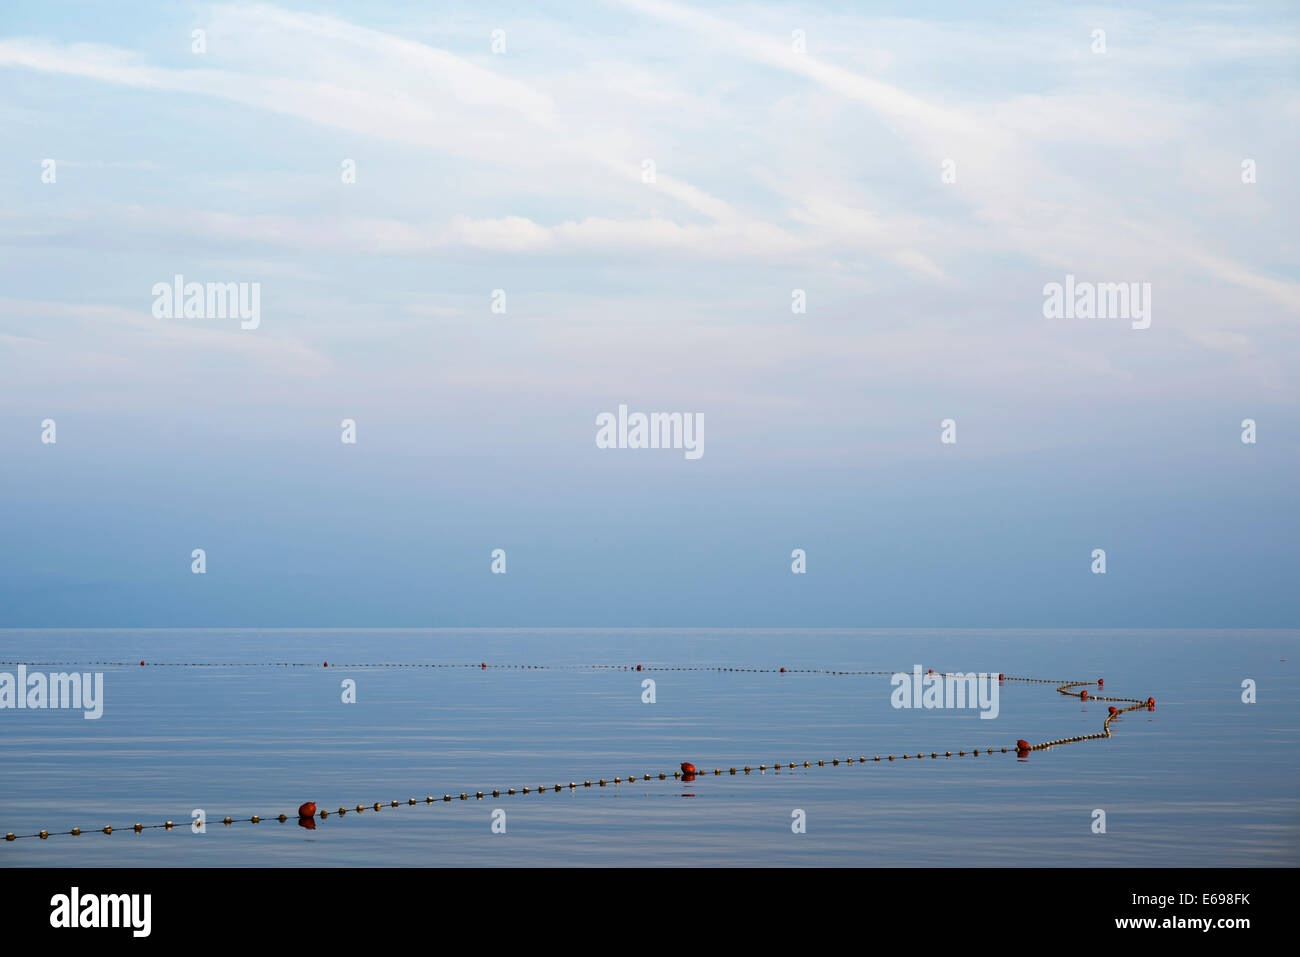 Blocked off non-swimmers area in the sea, in Umag, Monterol, Istria, Croatia Stock Photo